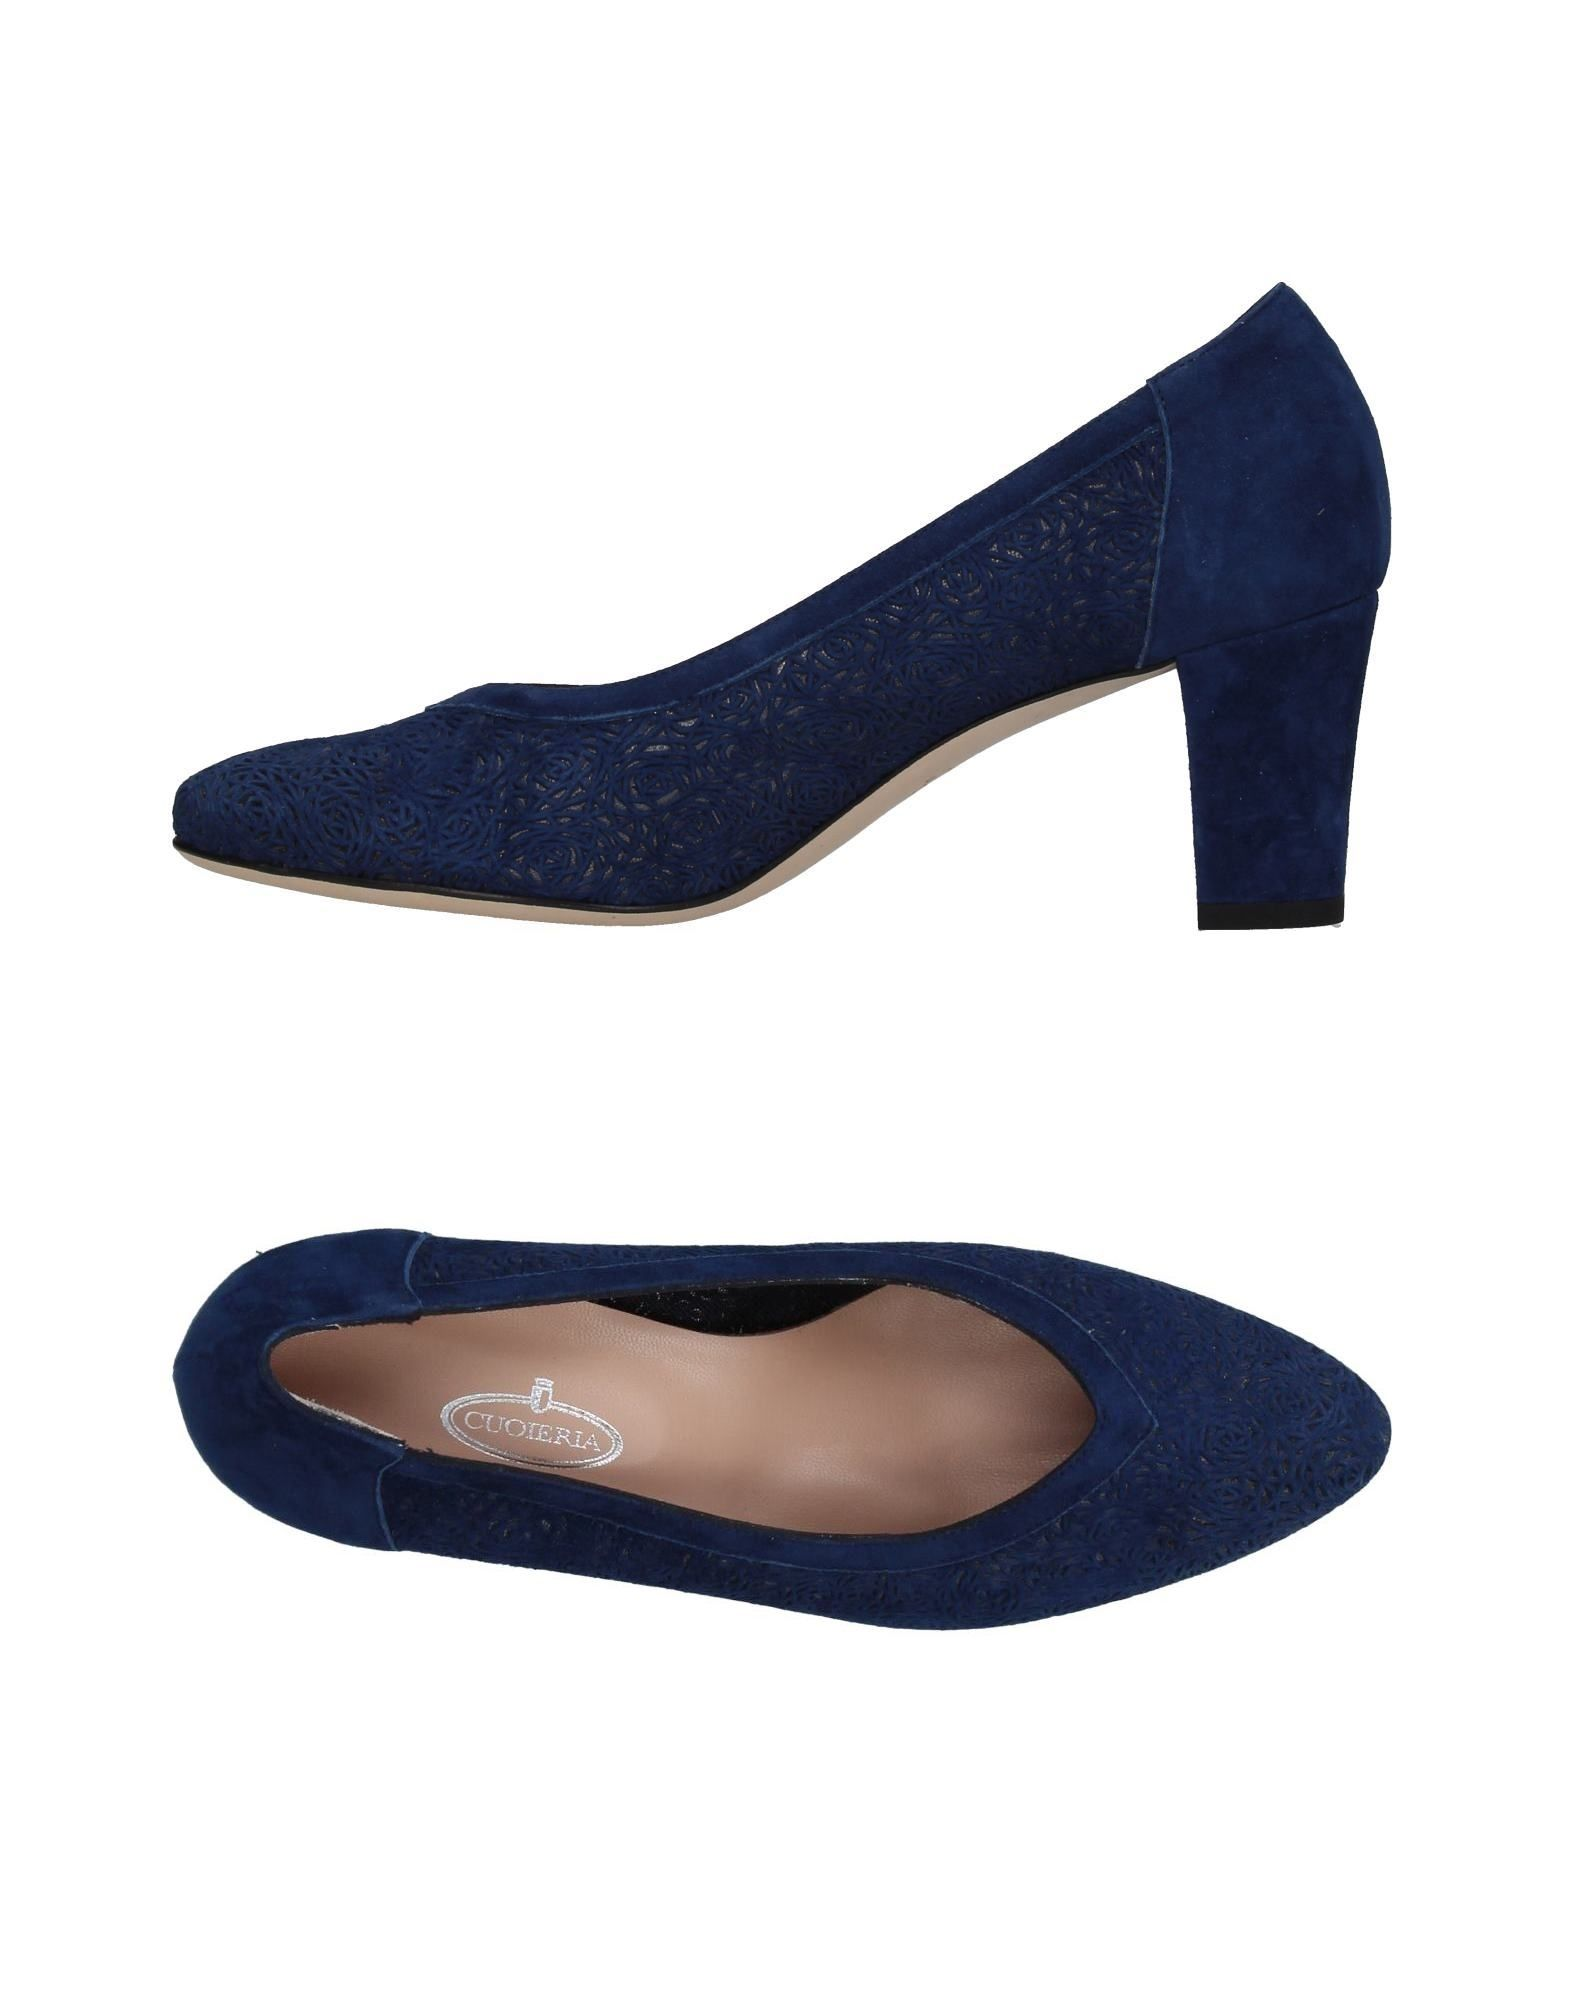 Cuoieria Pumps Damen  11358971WL Gute Qualität beliebte Schuhe